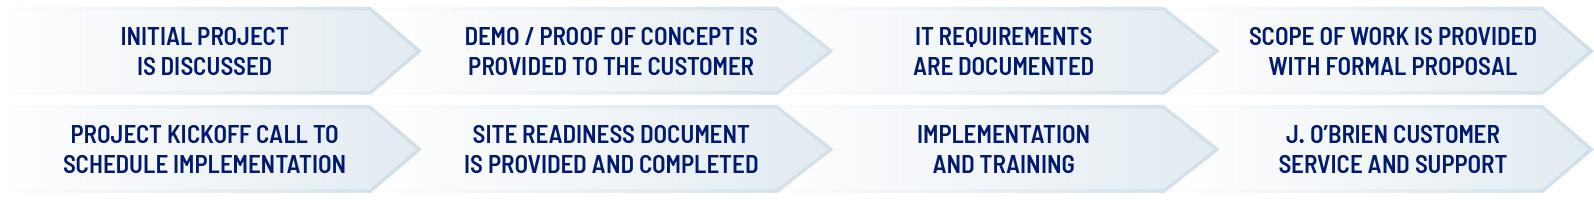 J. O'Brien Management Process